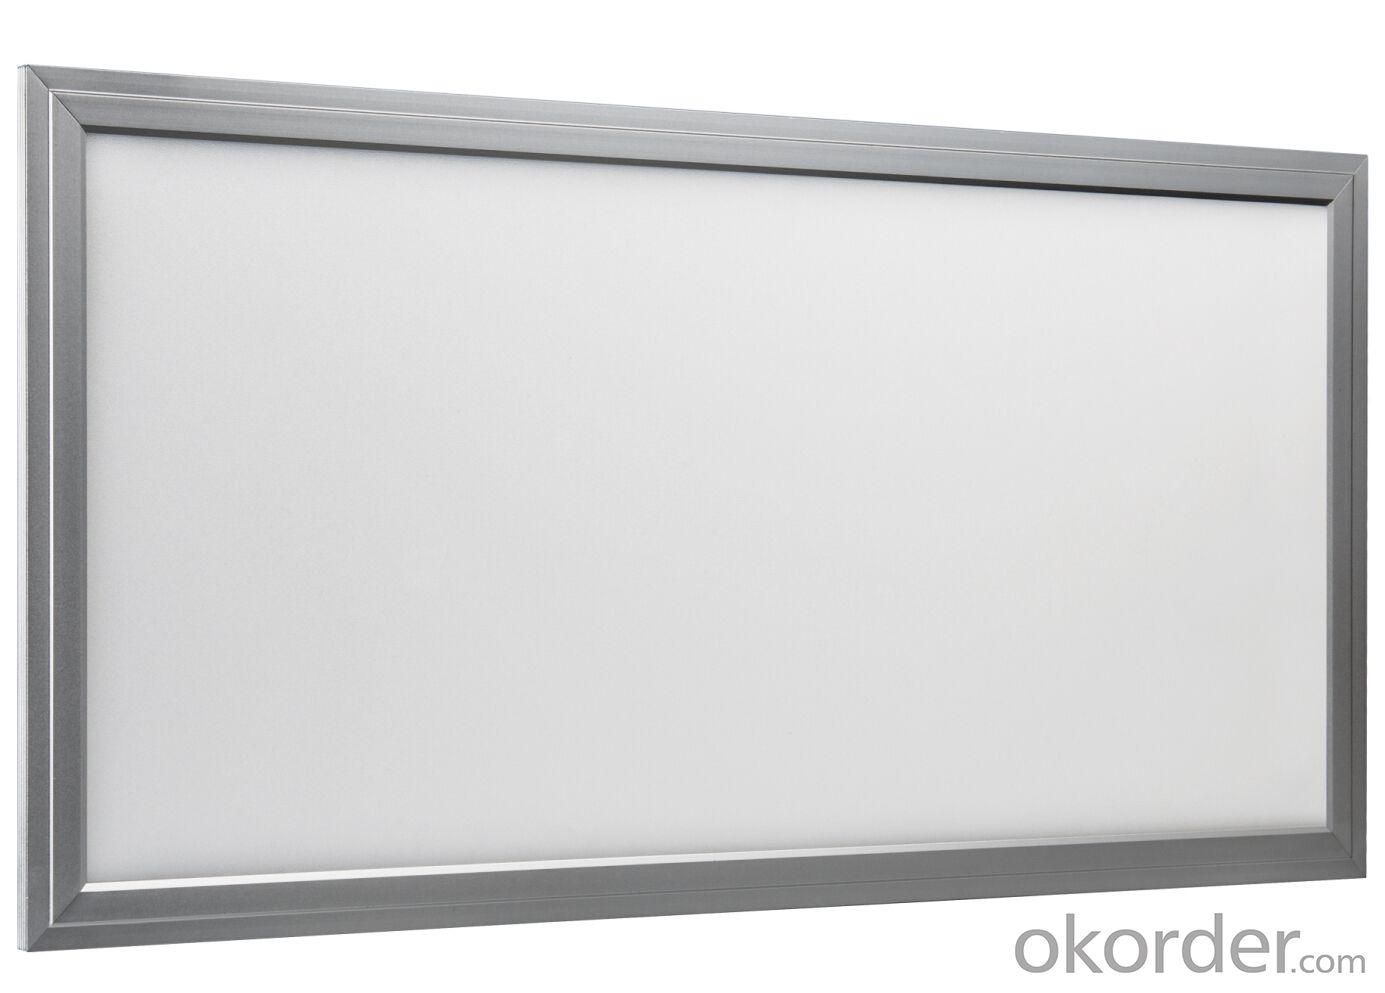 FLAT PANEL LED LIGHT-72W - SMD2835 LED-7200LM- 600MM*1200MM